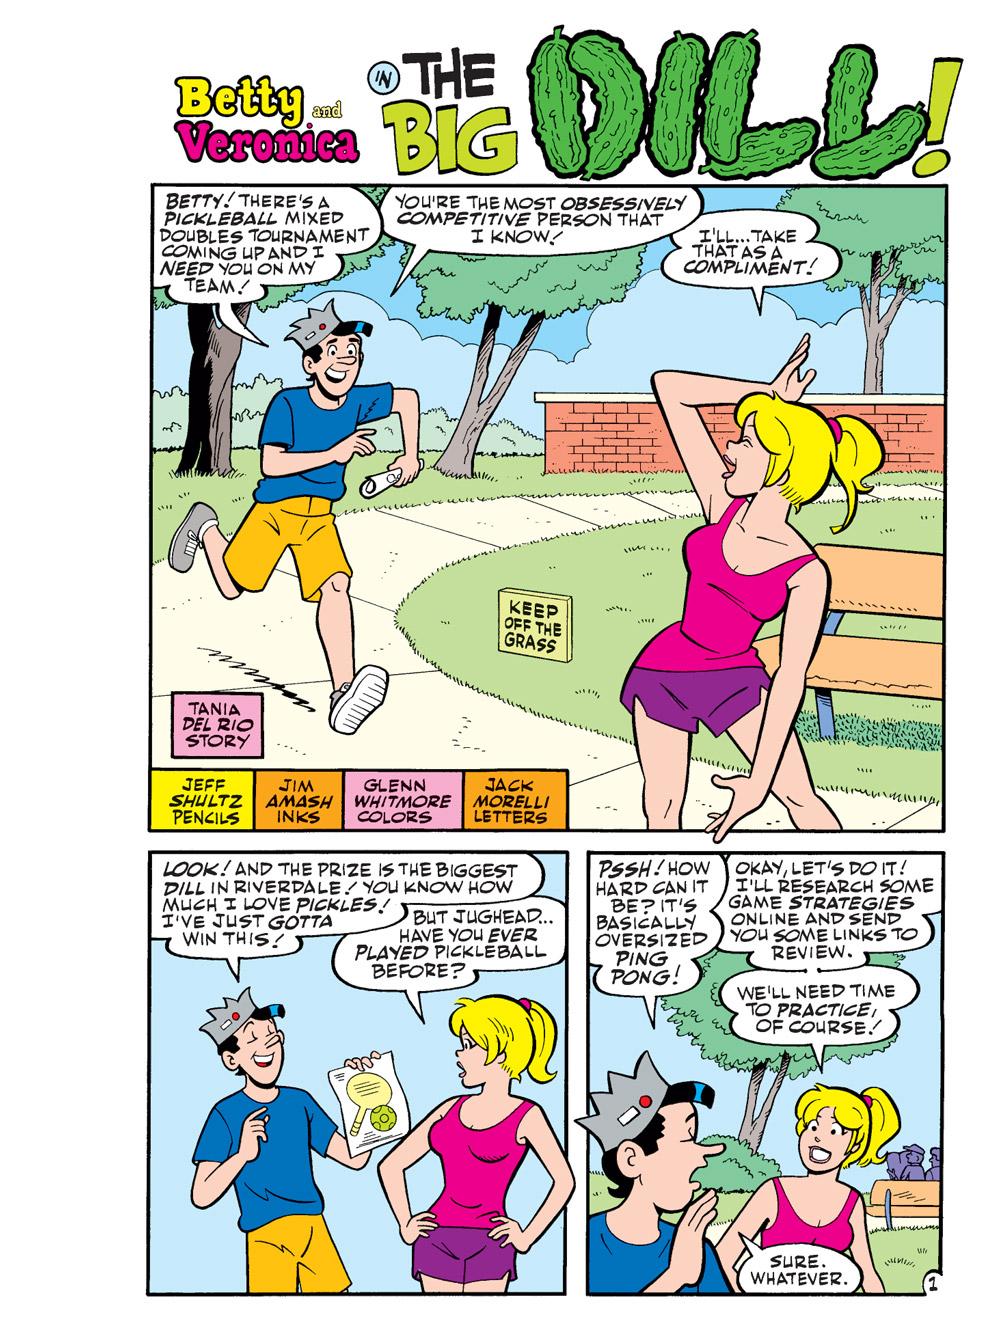 WorldOfBettyAndVeronicaJumboComicsDigest_005-2 ComicList Previews: WORLD OF BETTY AND VERONICA JUMBO COMICS DIGEST #5